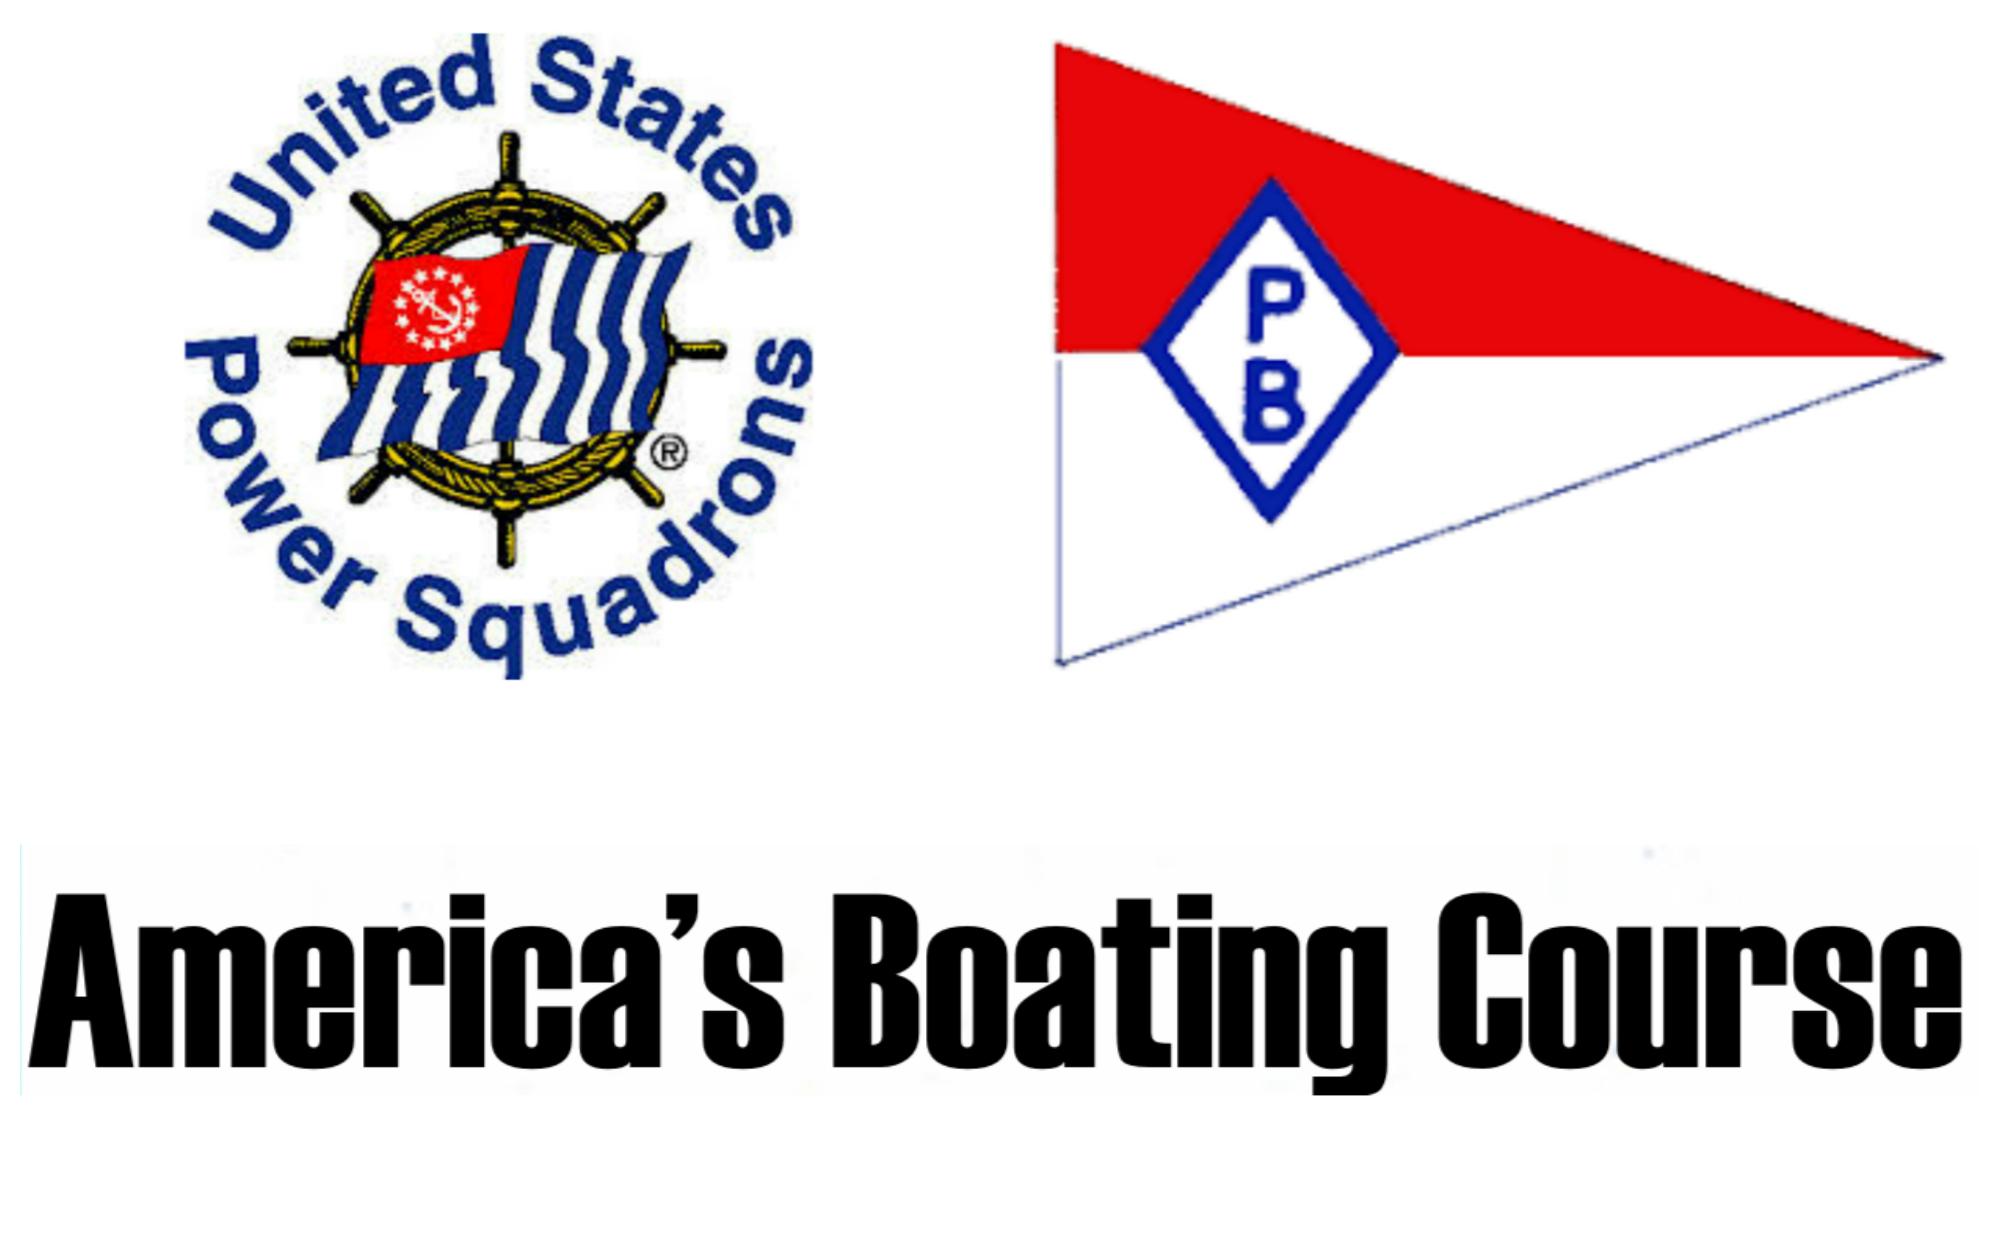 PSPS Boating Course image.jpg